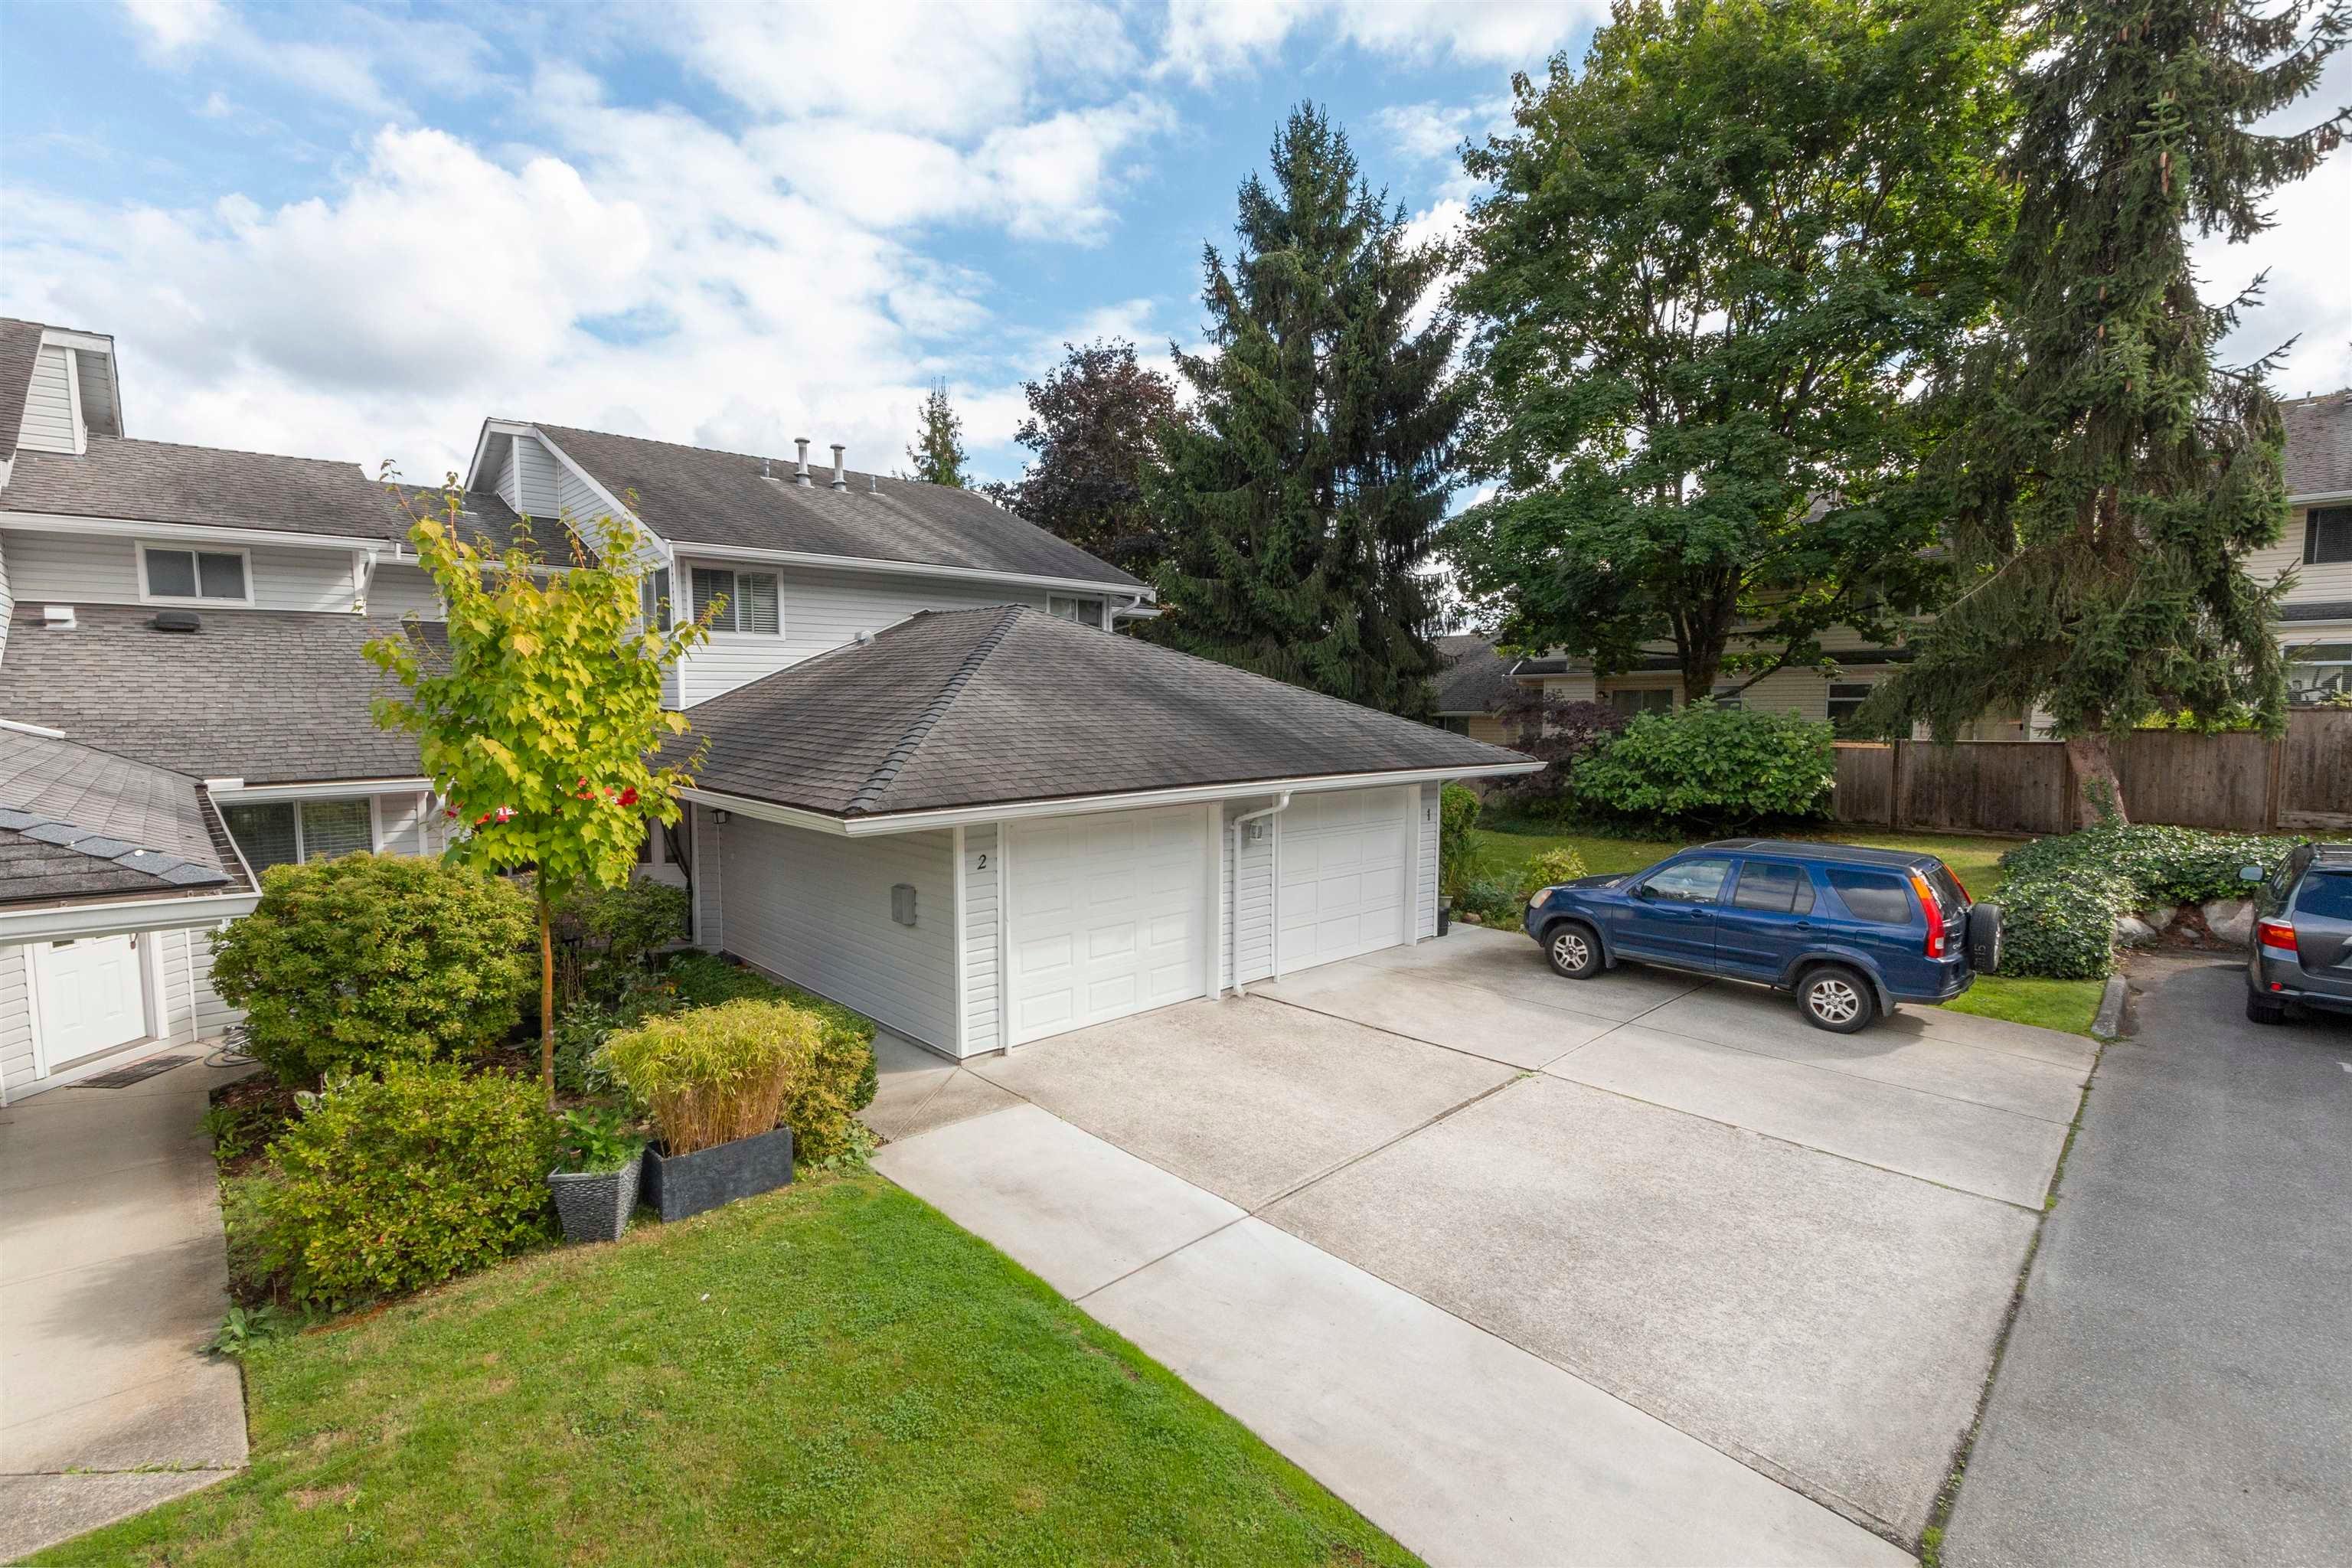 2 1190 FALCON DRIVE - Eagle Ridge CQ Townhouse for sale, 3 Bedrooms (R2621583) - #1